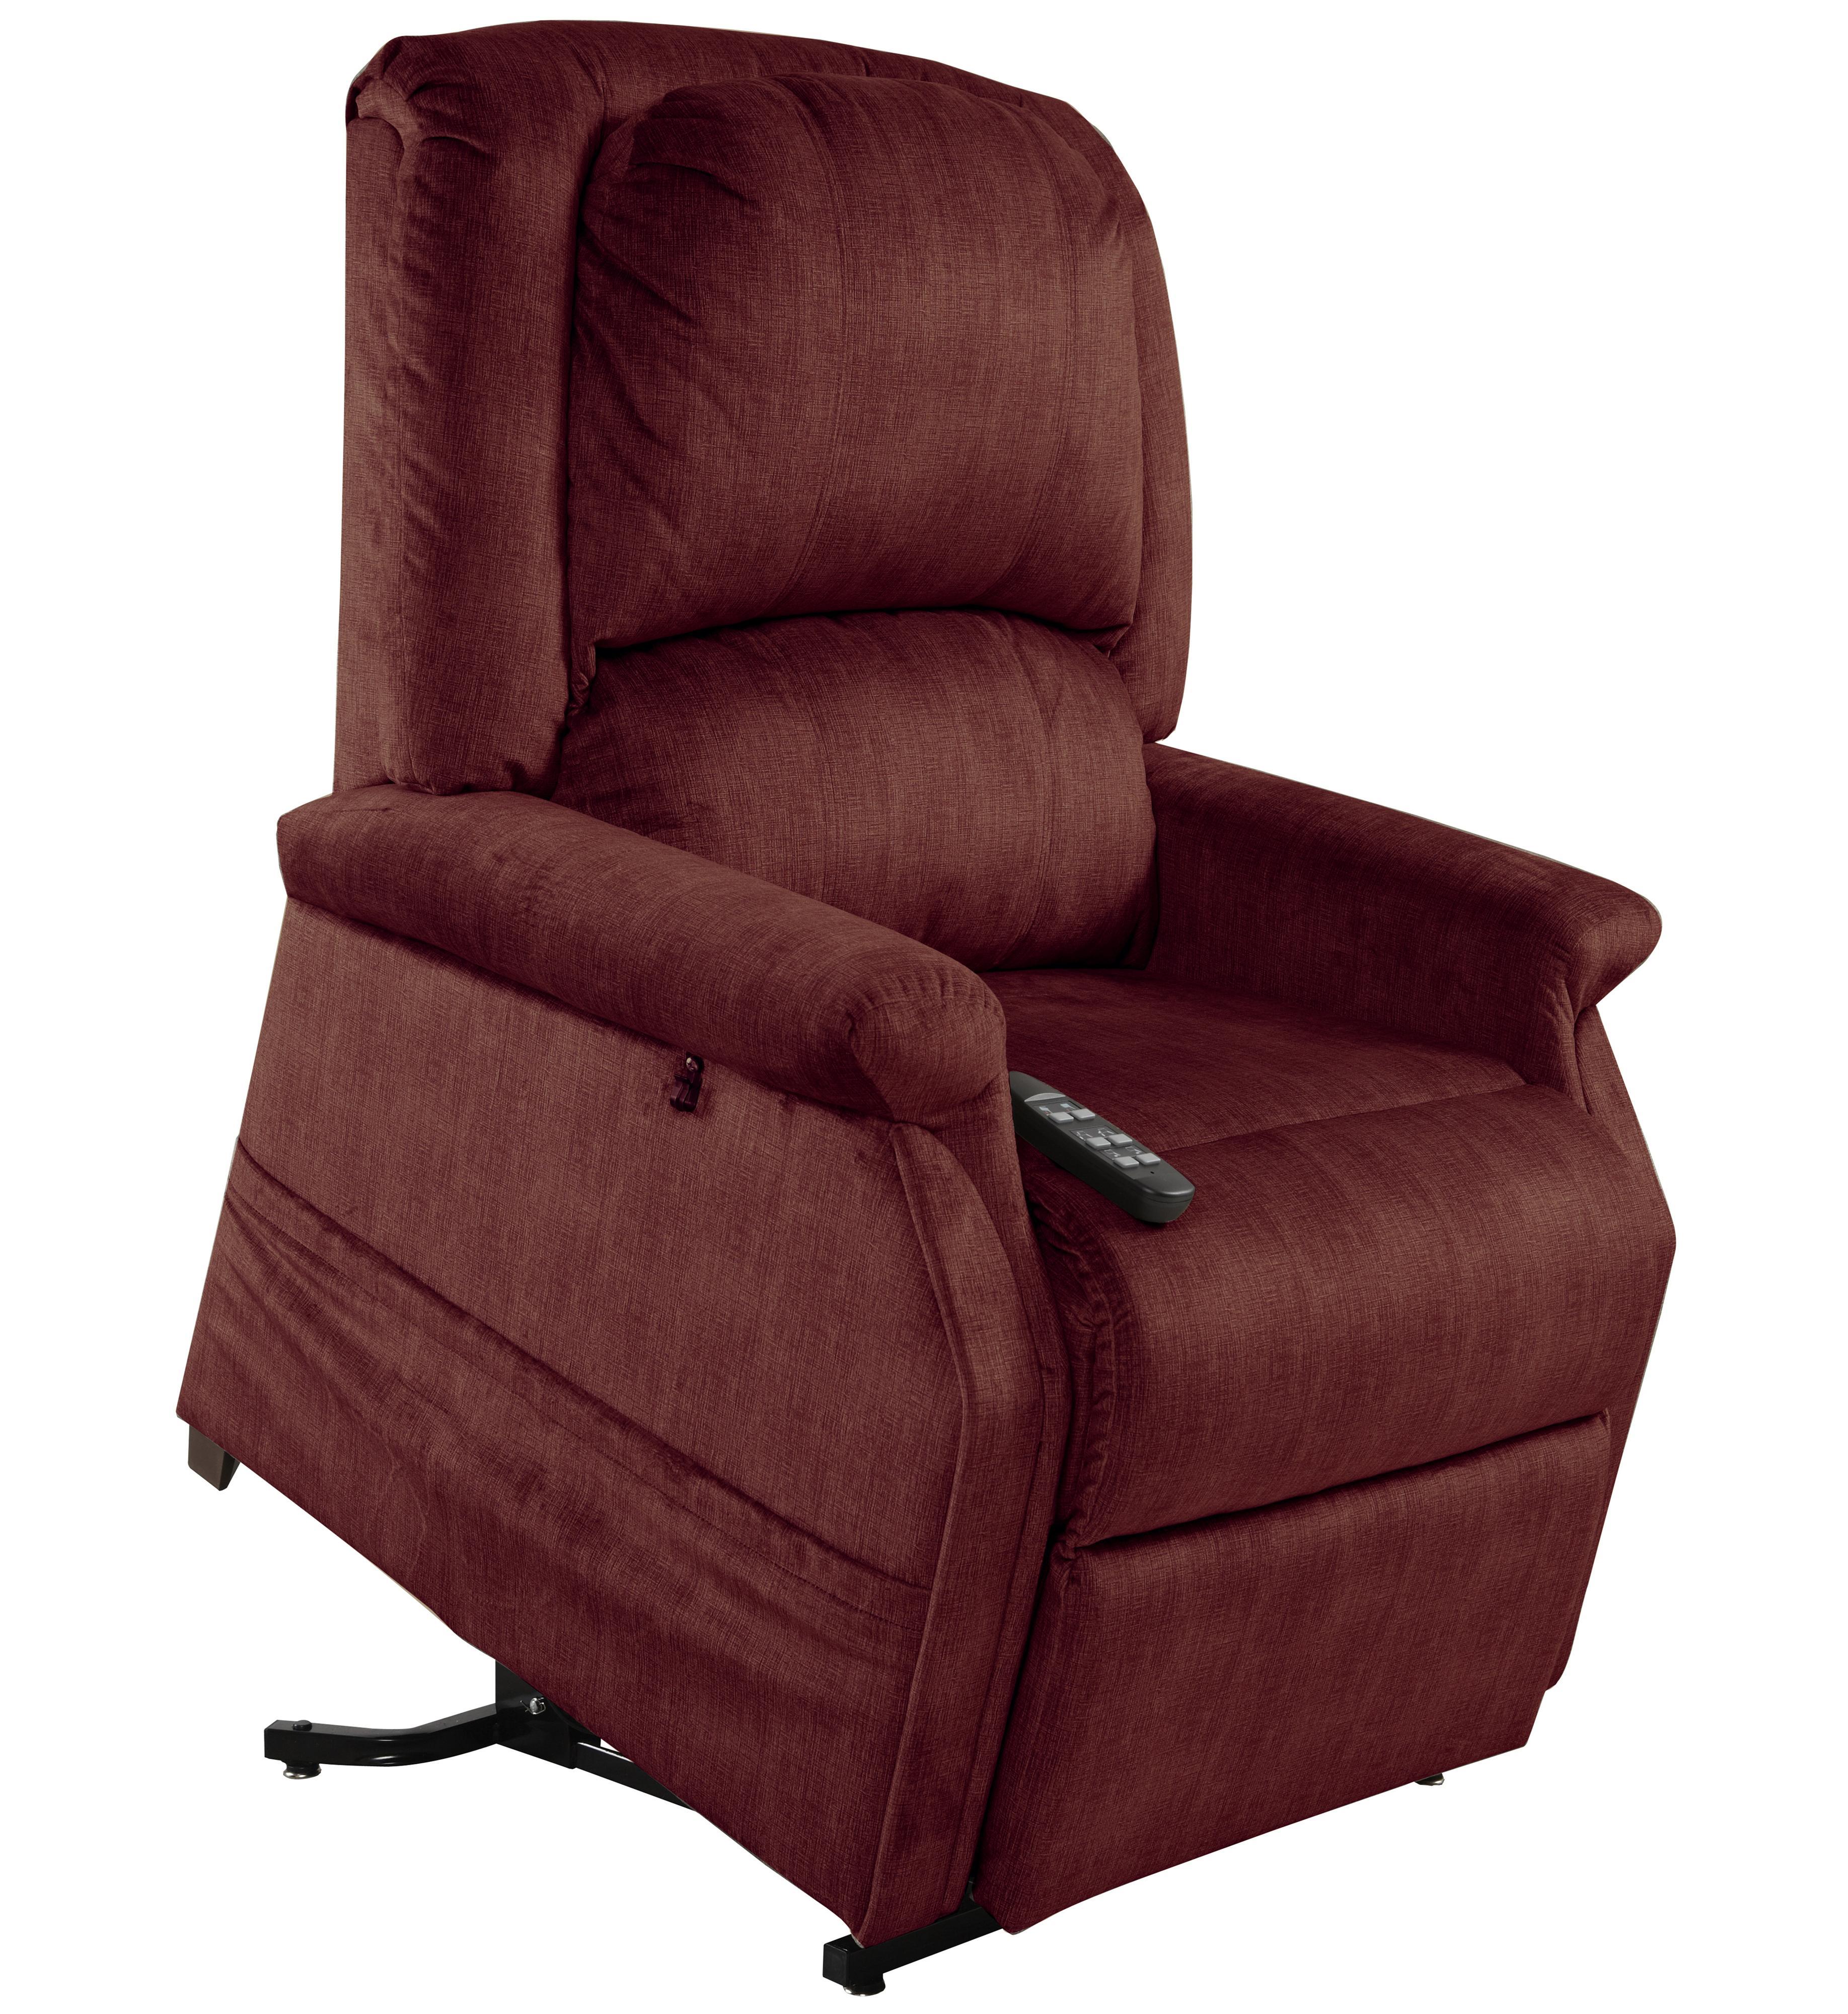 Mega Motion Lift Chairs Infinite Position Zero Gravity Recliner - Item Number: AS-3001 Bordeaux